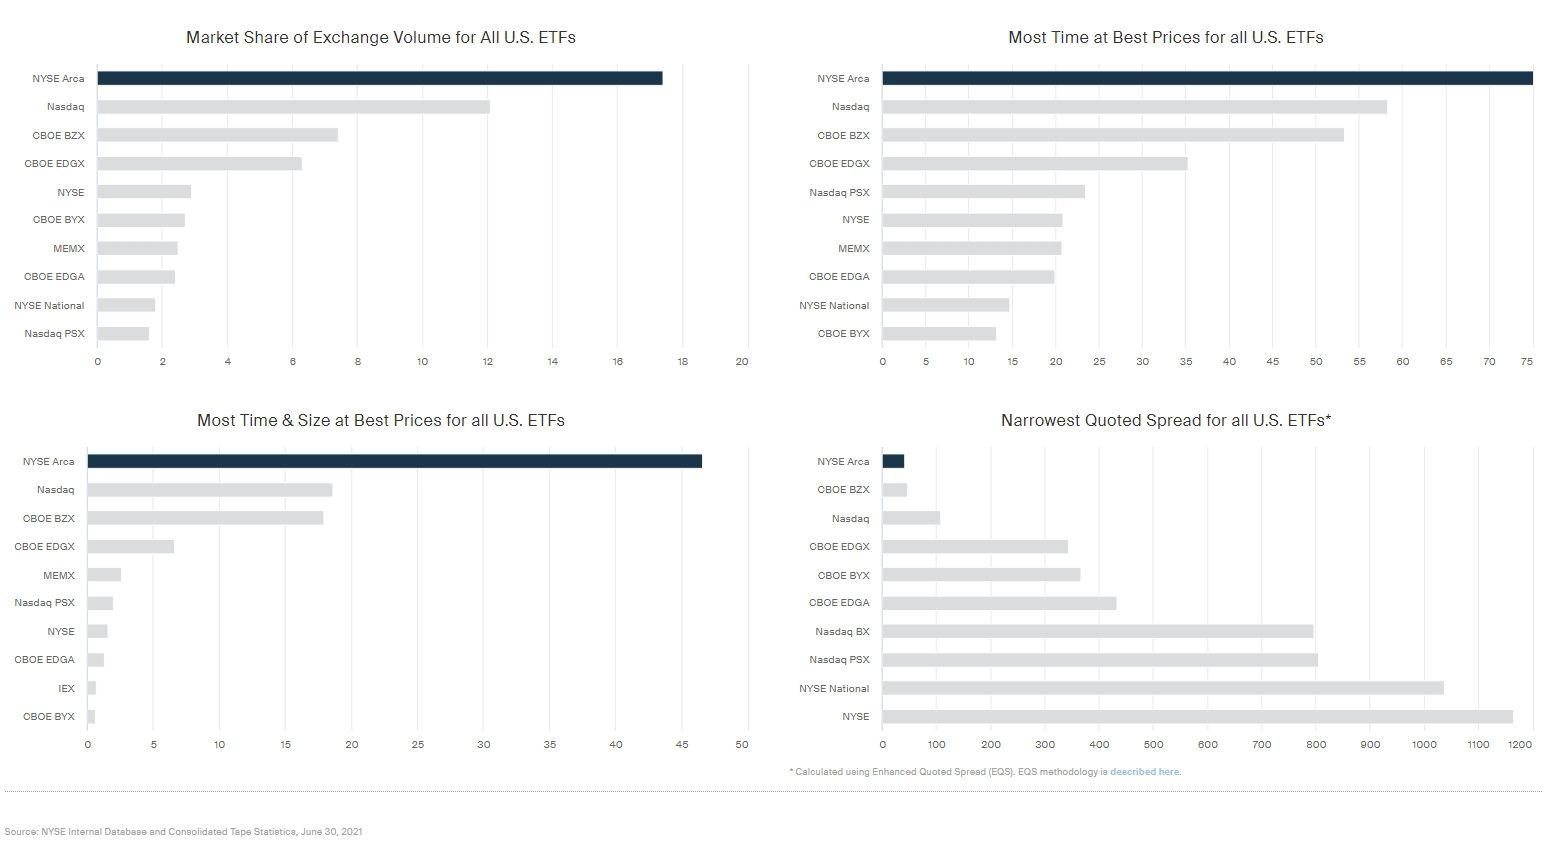 NYSE Arca Comparisons